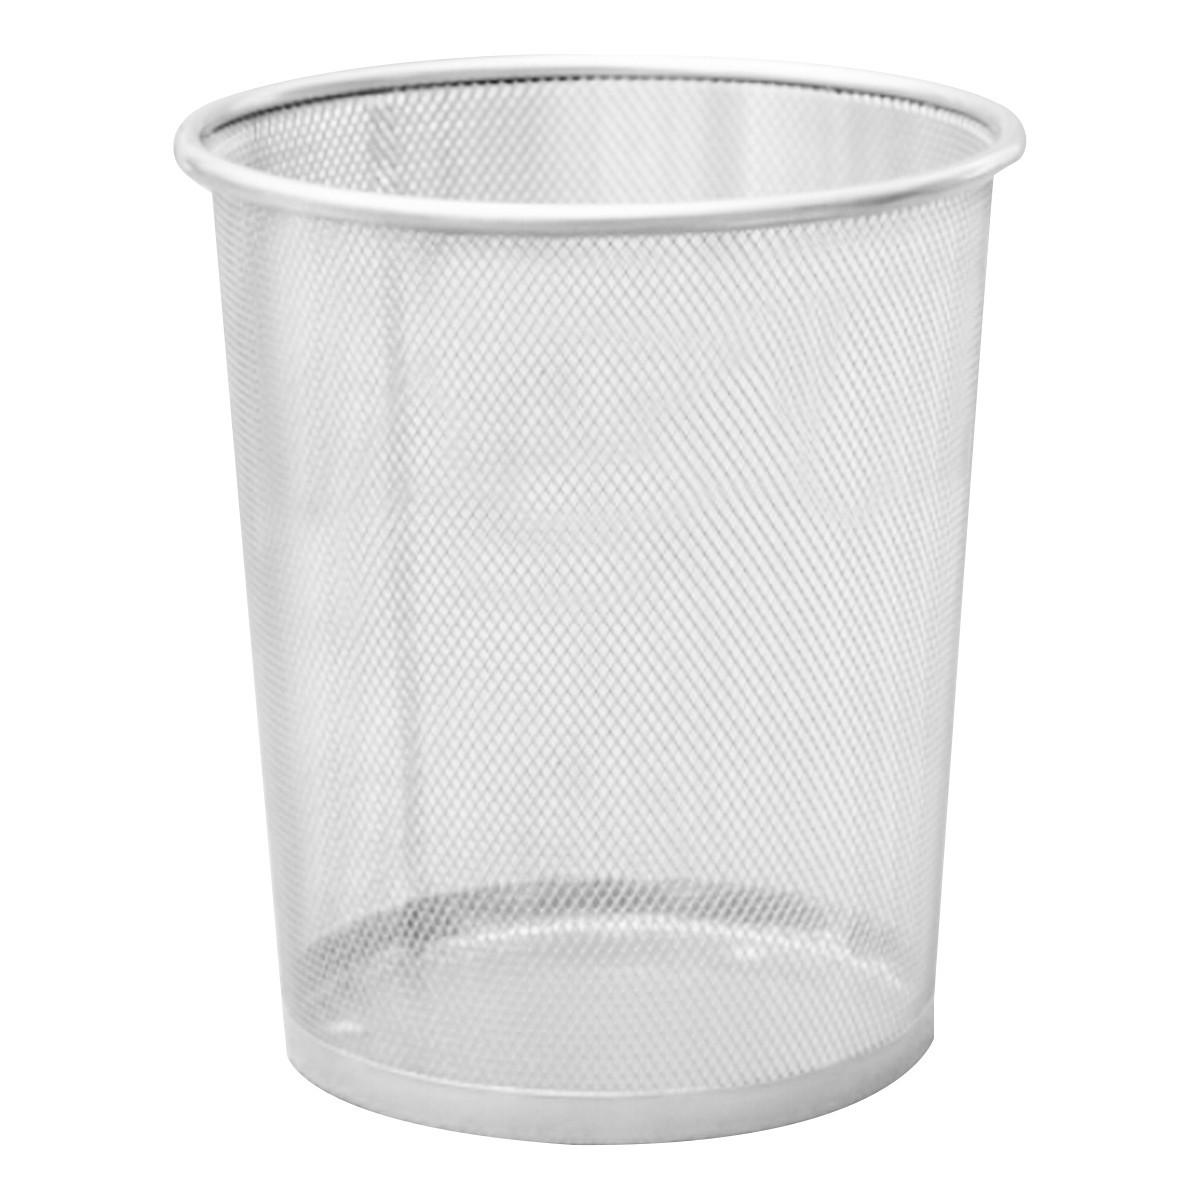 Office Can Metal Mesh Waste Bin Wastebasket Rubbish Paper Net Trash Basket  NEW  Intl | Lazada Singapore